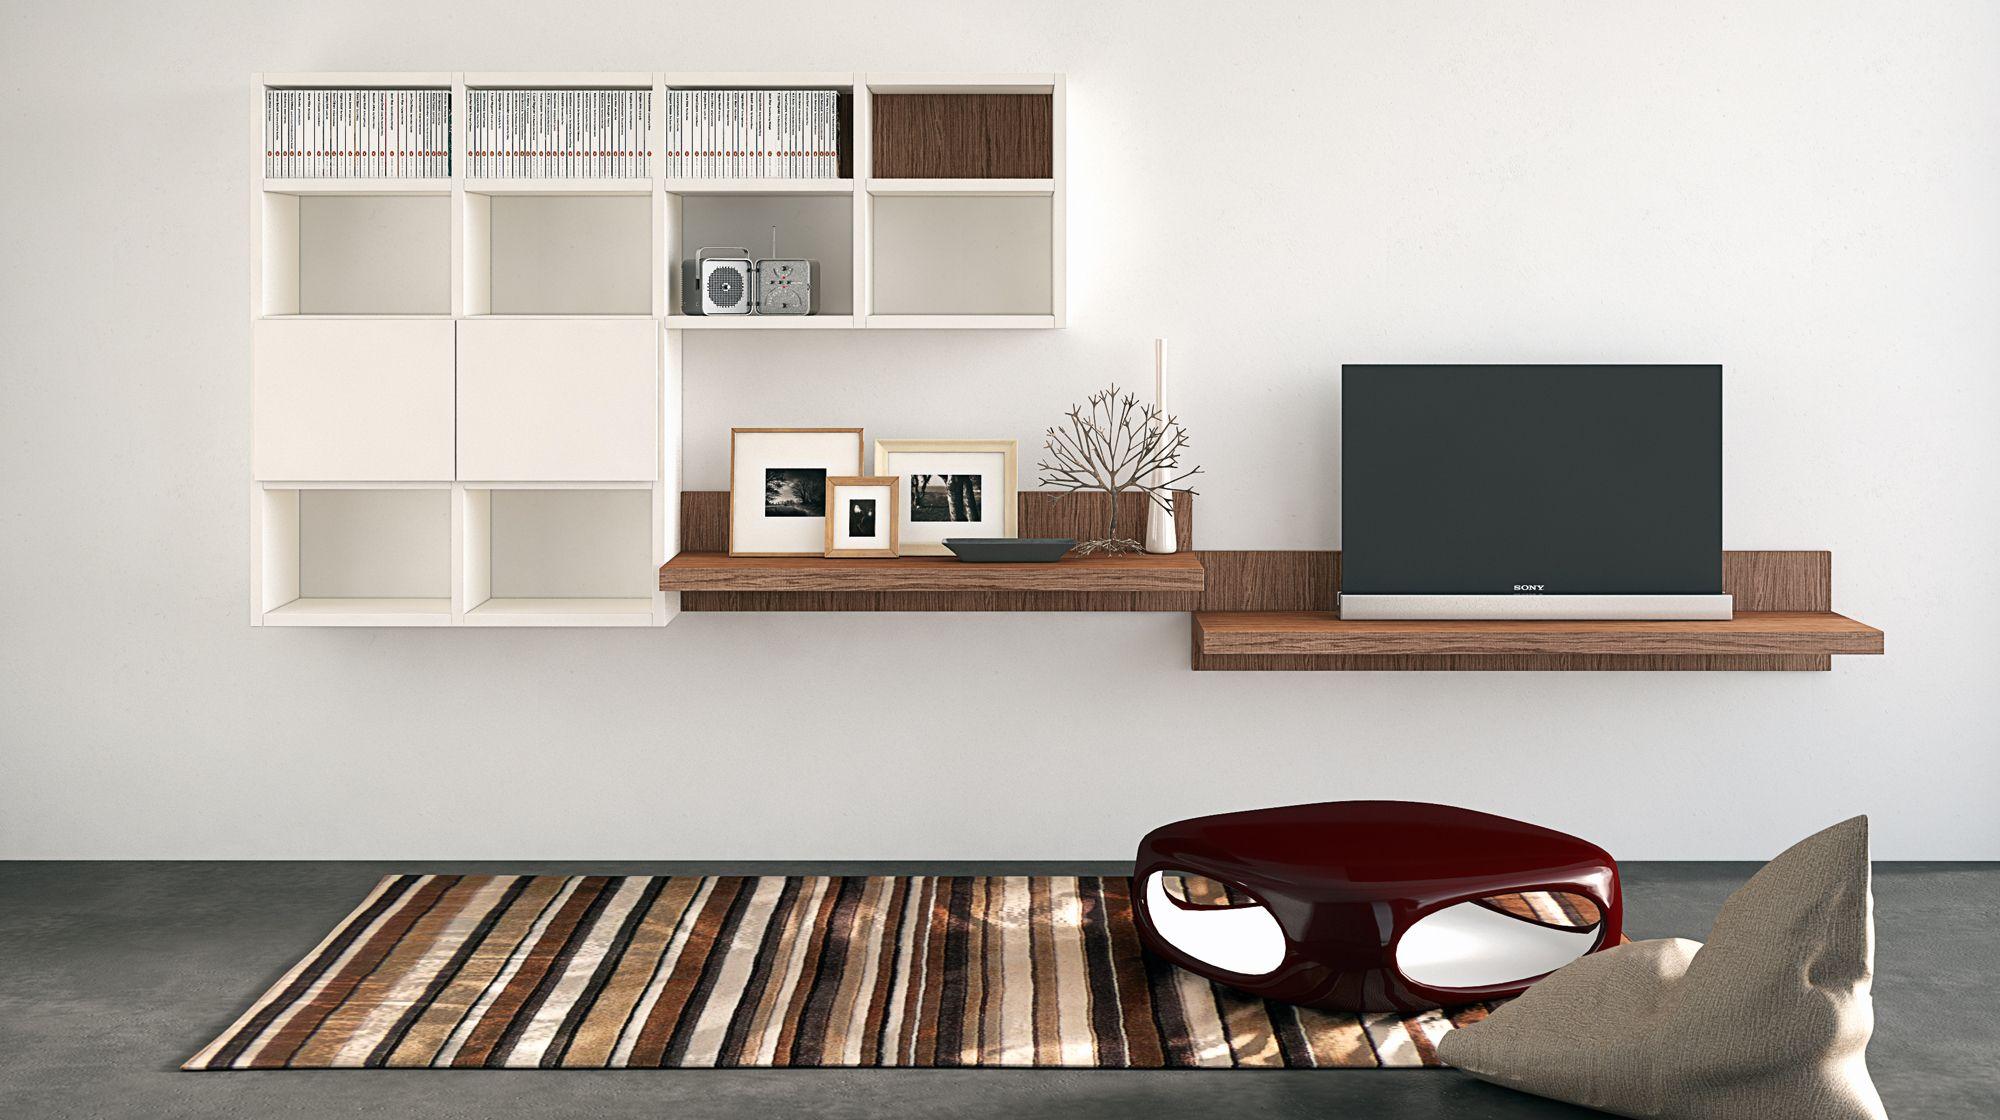 Pin by Veneta Cucine on LIVING | Pinterest | Living rooms, Spaces ...